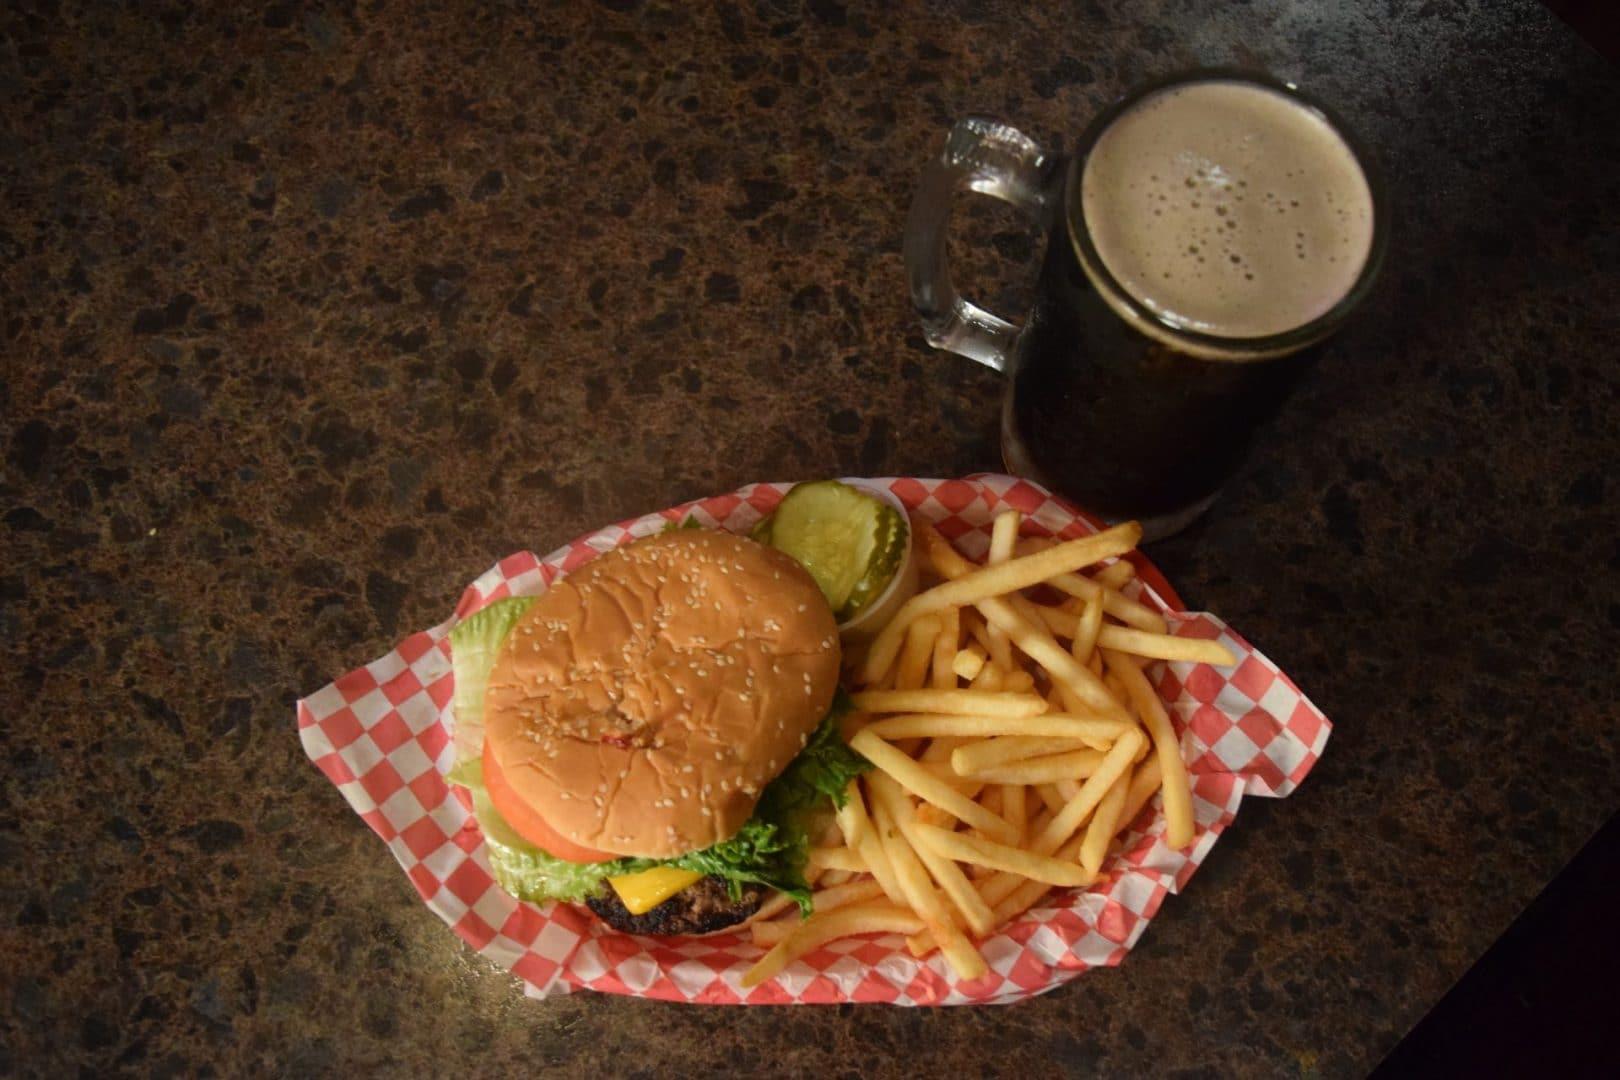 best burger in kenosha, kenosha bar and grill, rons place